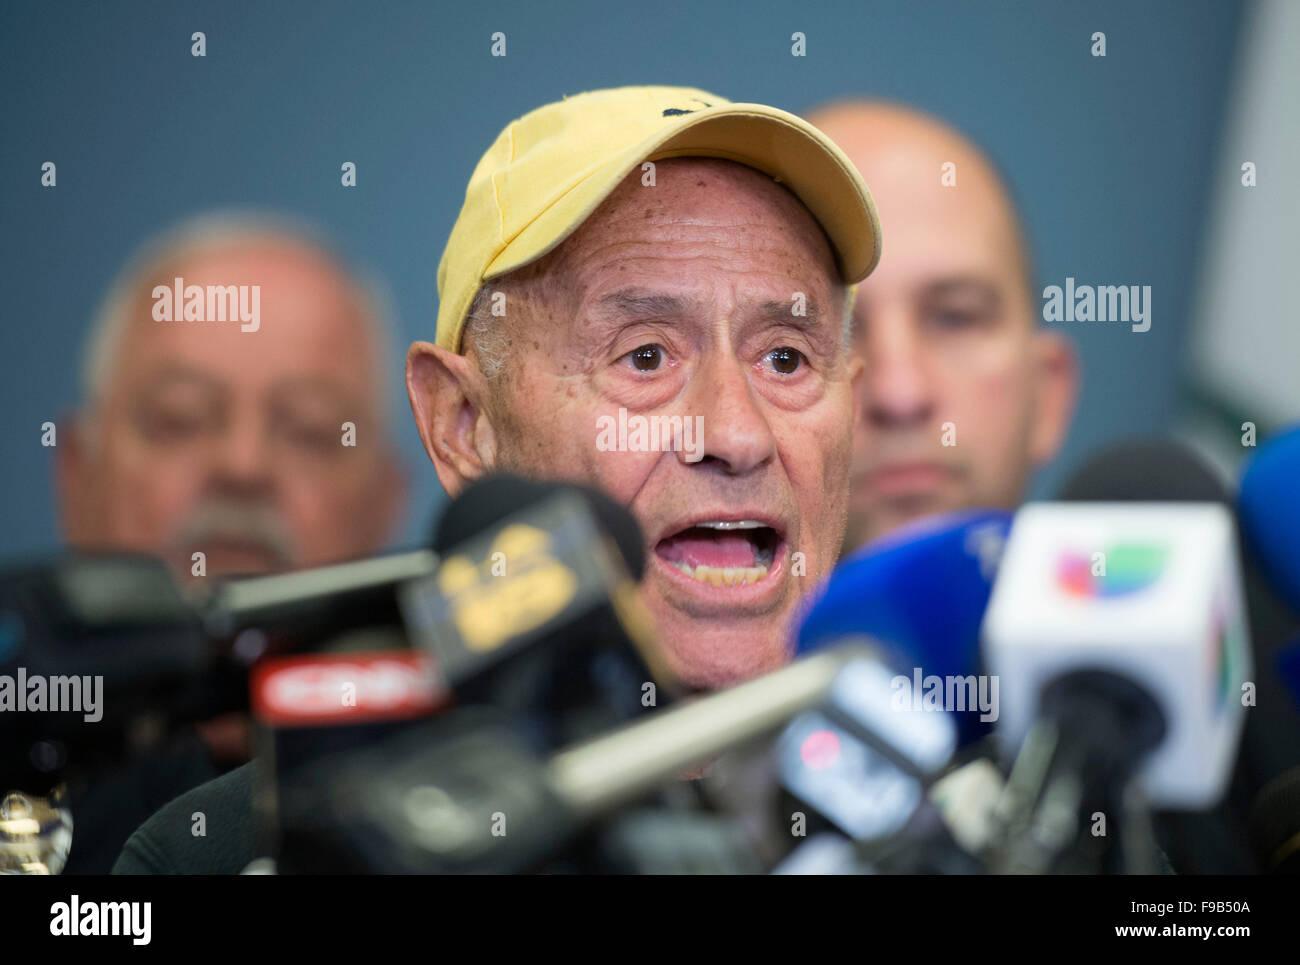 (151215) -- LOS ANGELES, Dec. 15, 2015 (Xinhua) -- Schools Superintendent Ramon Cortines speaks to the media, in - Stock Image